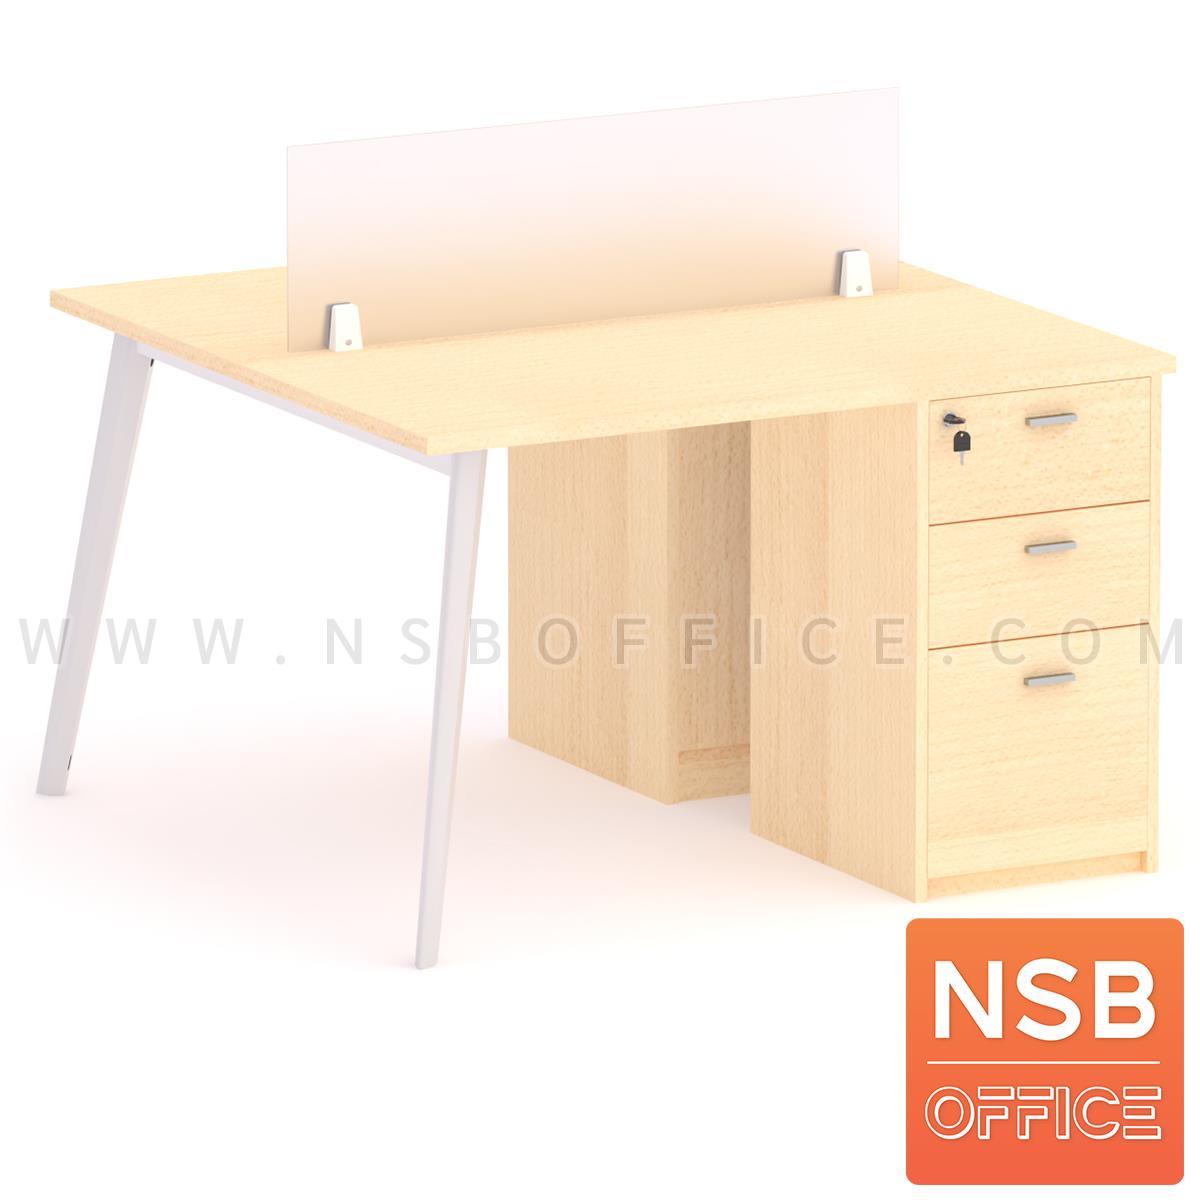 A31A007:ชุดโต๊ะทำงานกลุ่ม รุ่น Outer (เอ็าเทอร์) 2, 4, 6 ที่นั่ง  พร้อมมินิสกรีนและตู้ลิ้นชักไม้